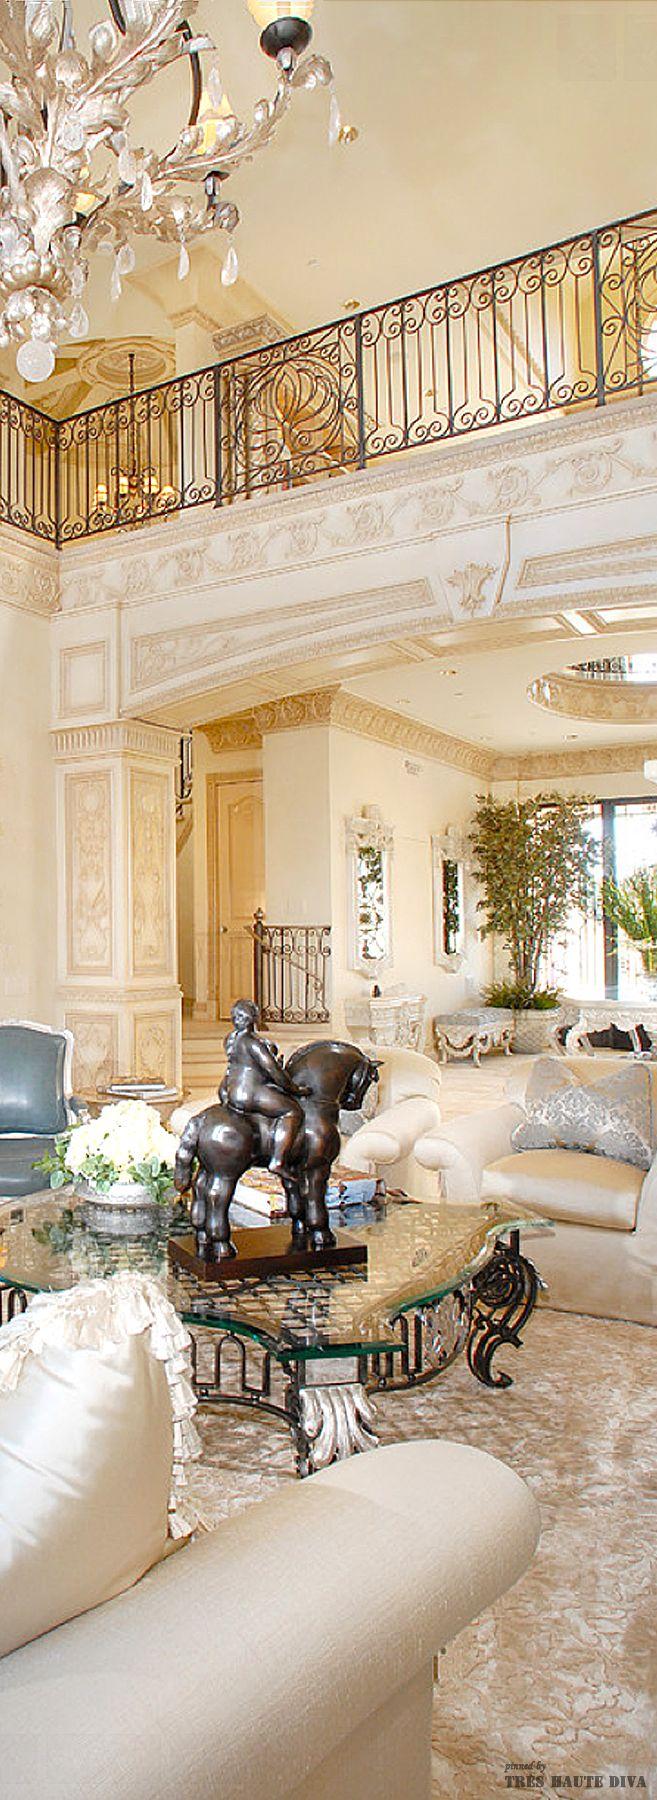 J U0027 Adore FRANCE! ~ ♥ ***French Chateau · French Chateau DecorLuxury ...